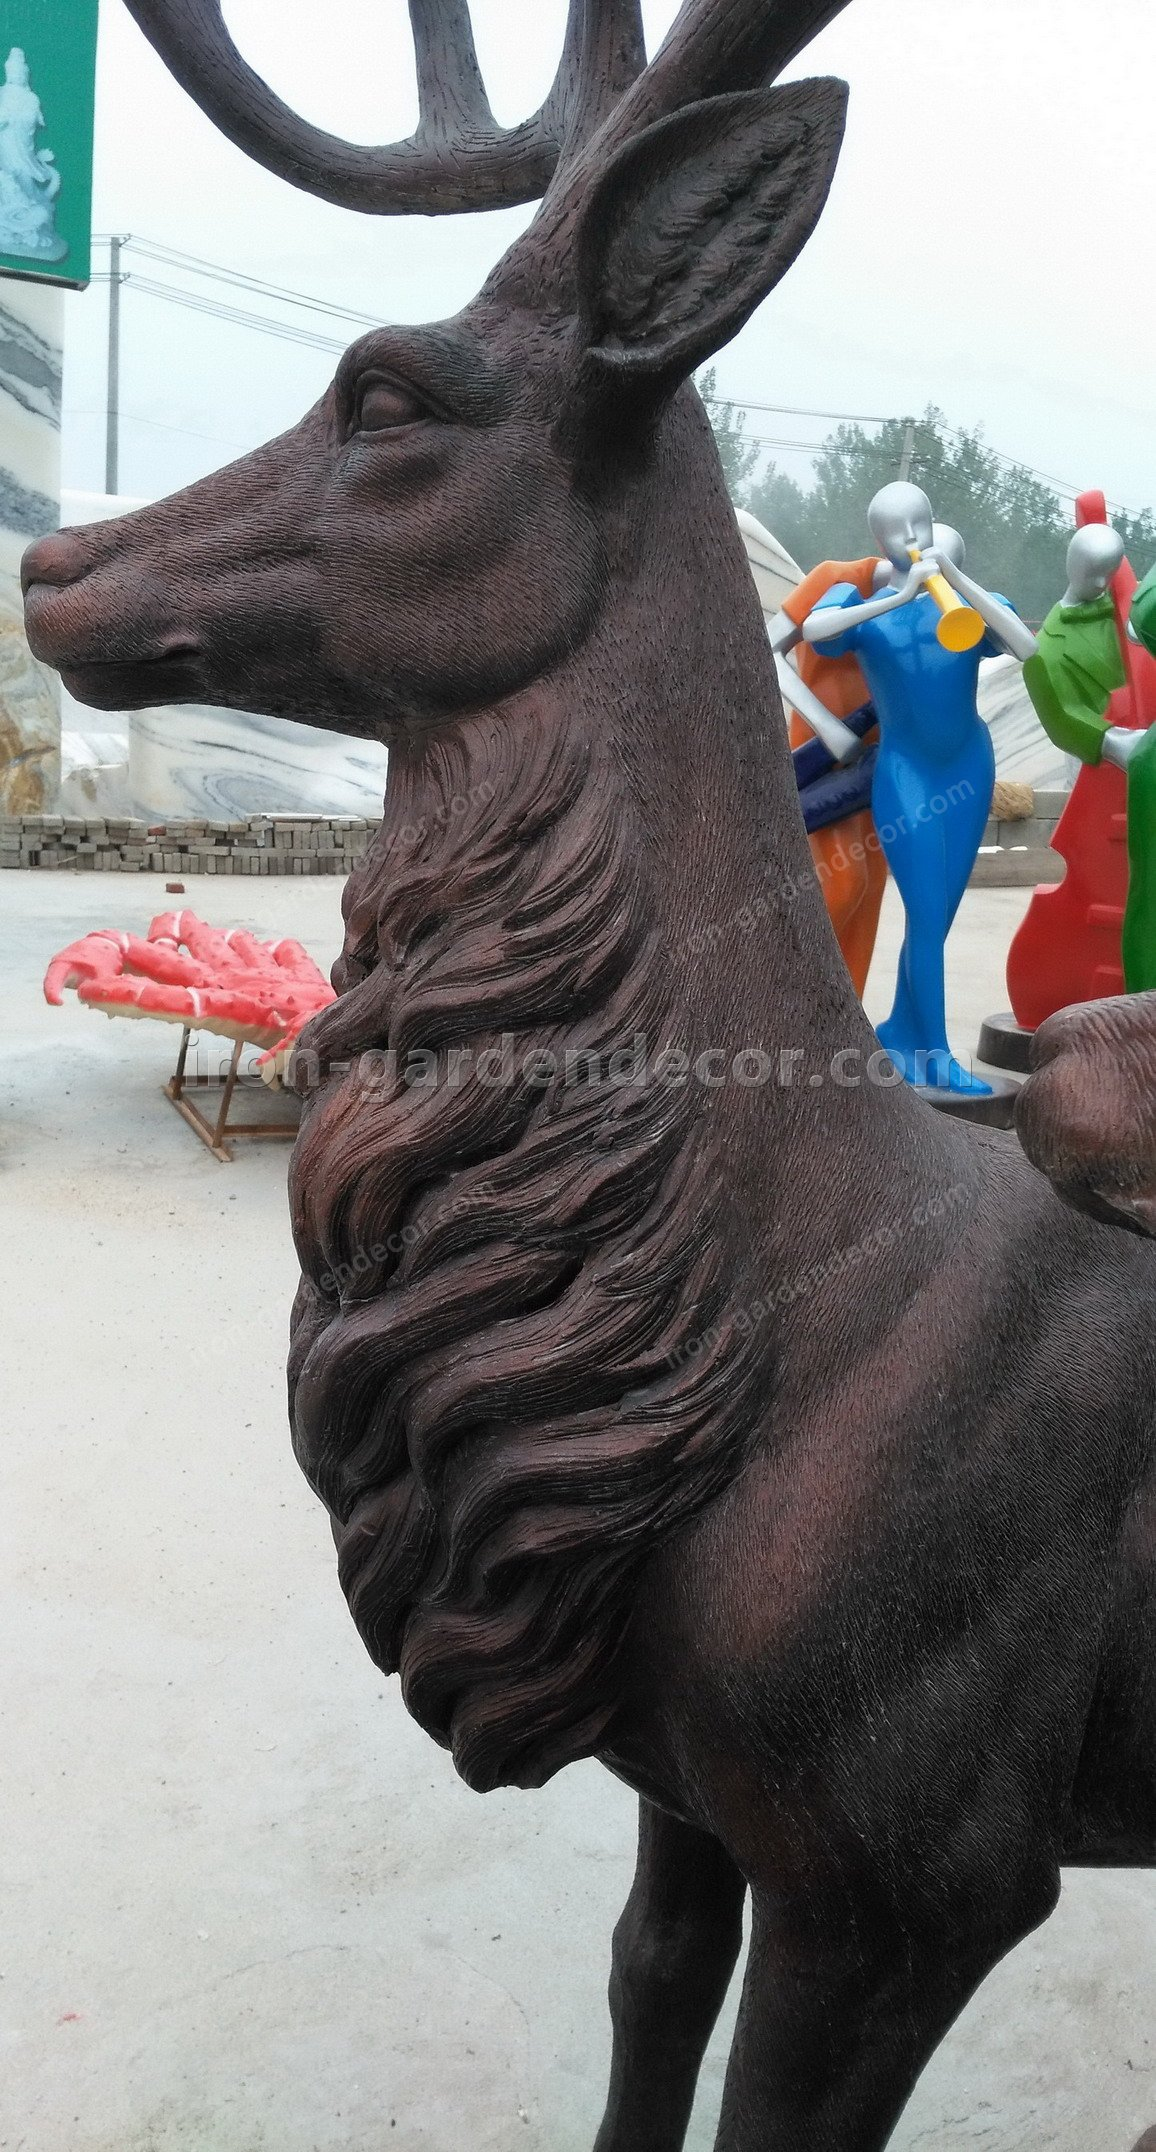 Home decoration outdoor garden stage animal resin statue fiberglass-DEER FAMILY FS076 (4)